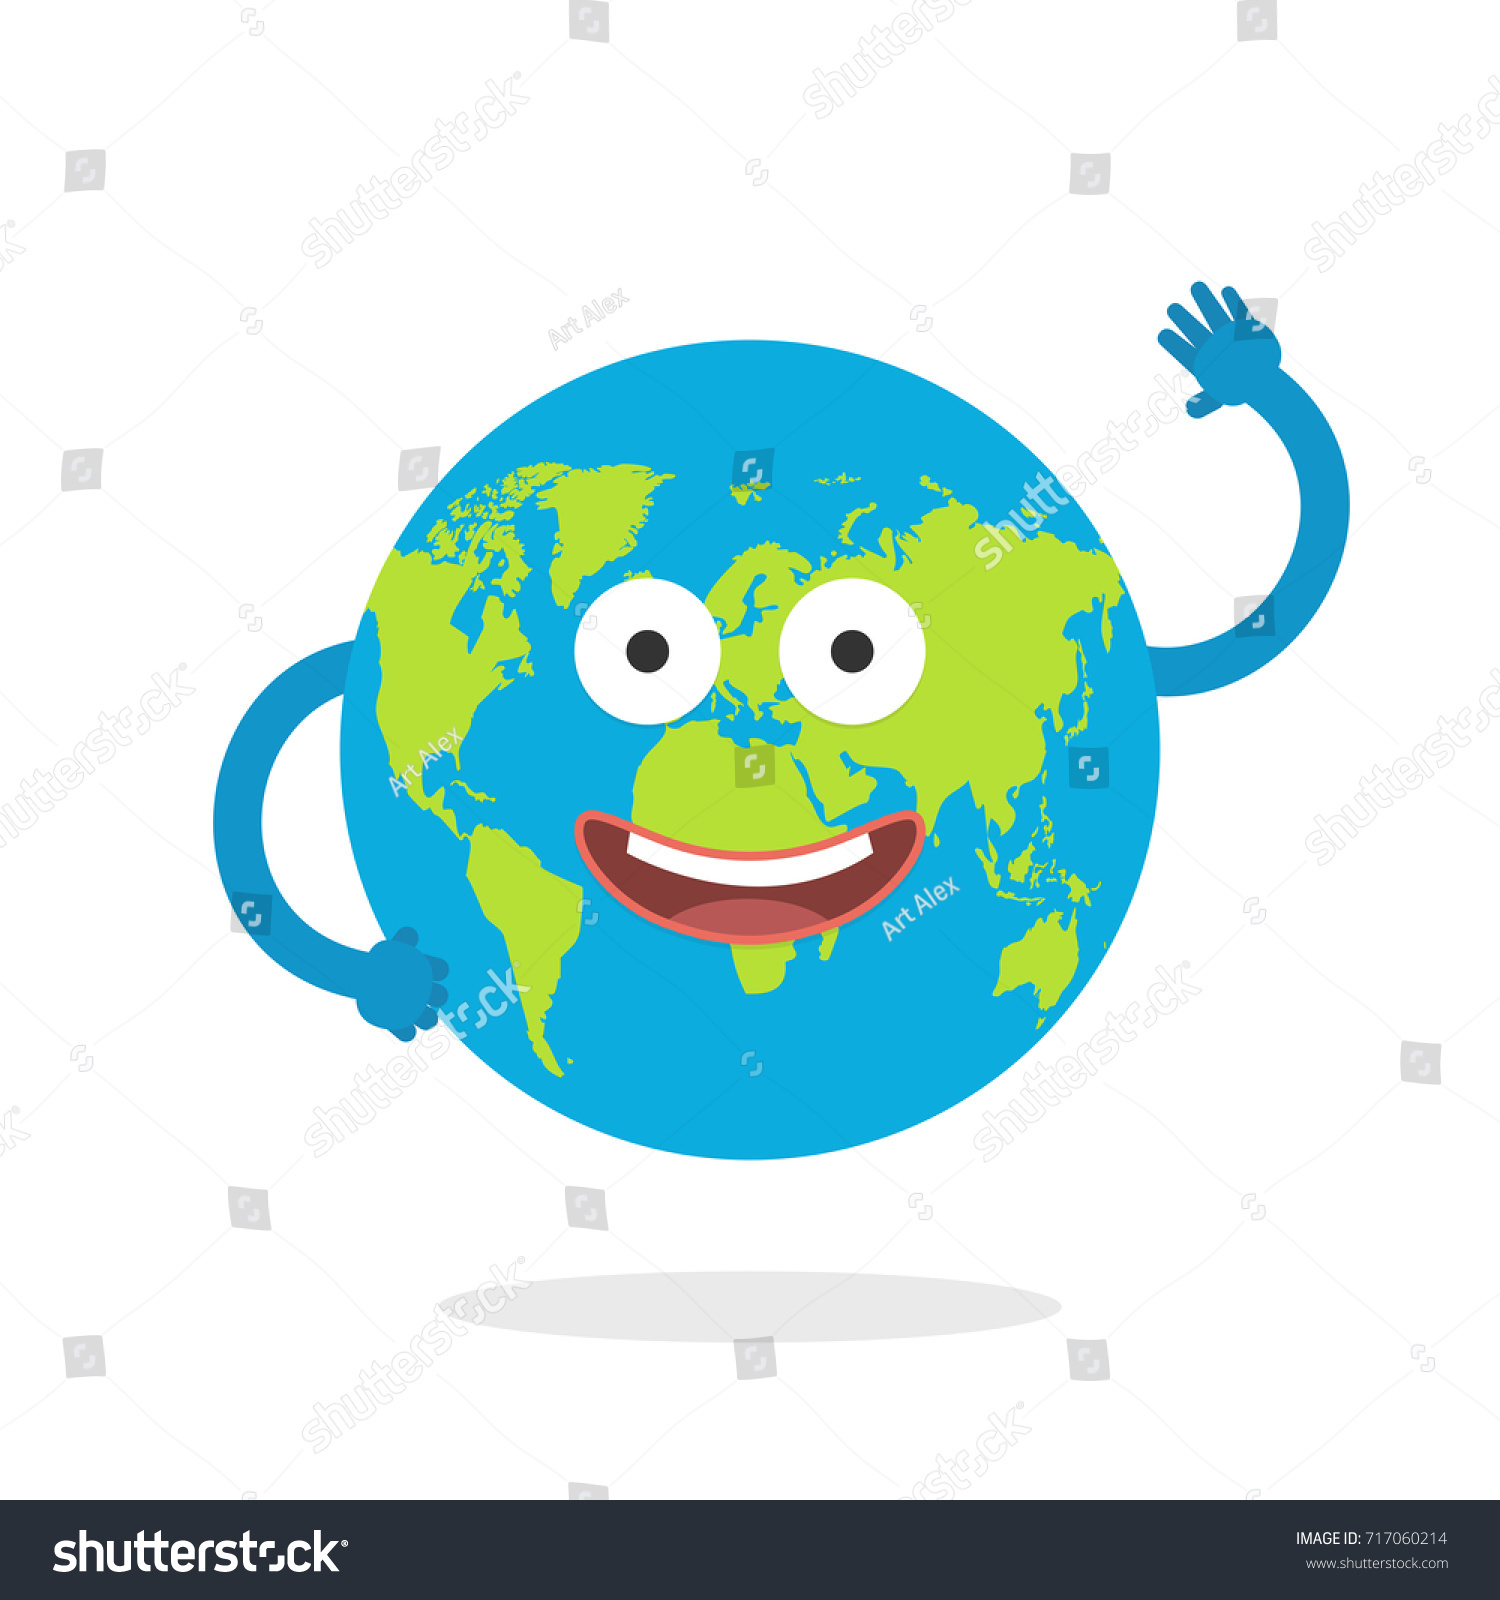 cartoon earth character world map globe stock vector 717060214 shutterstock